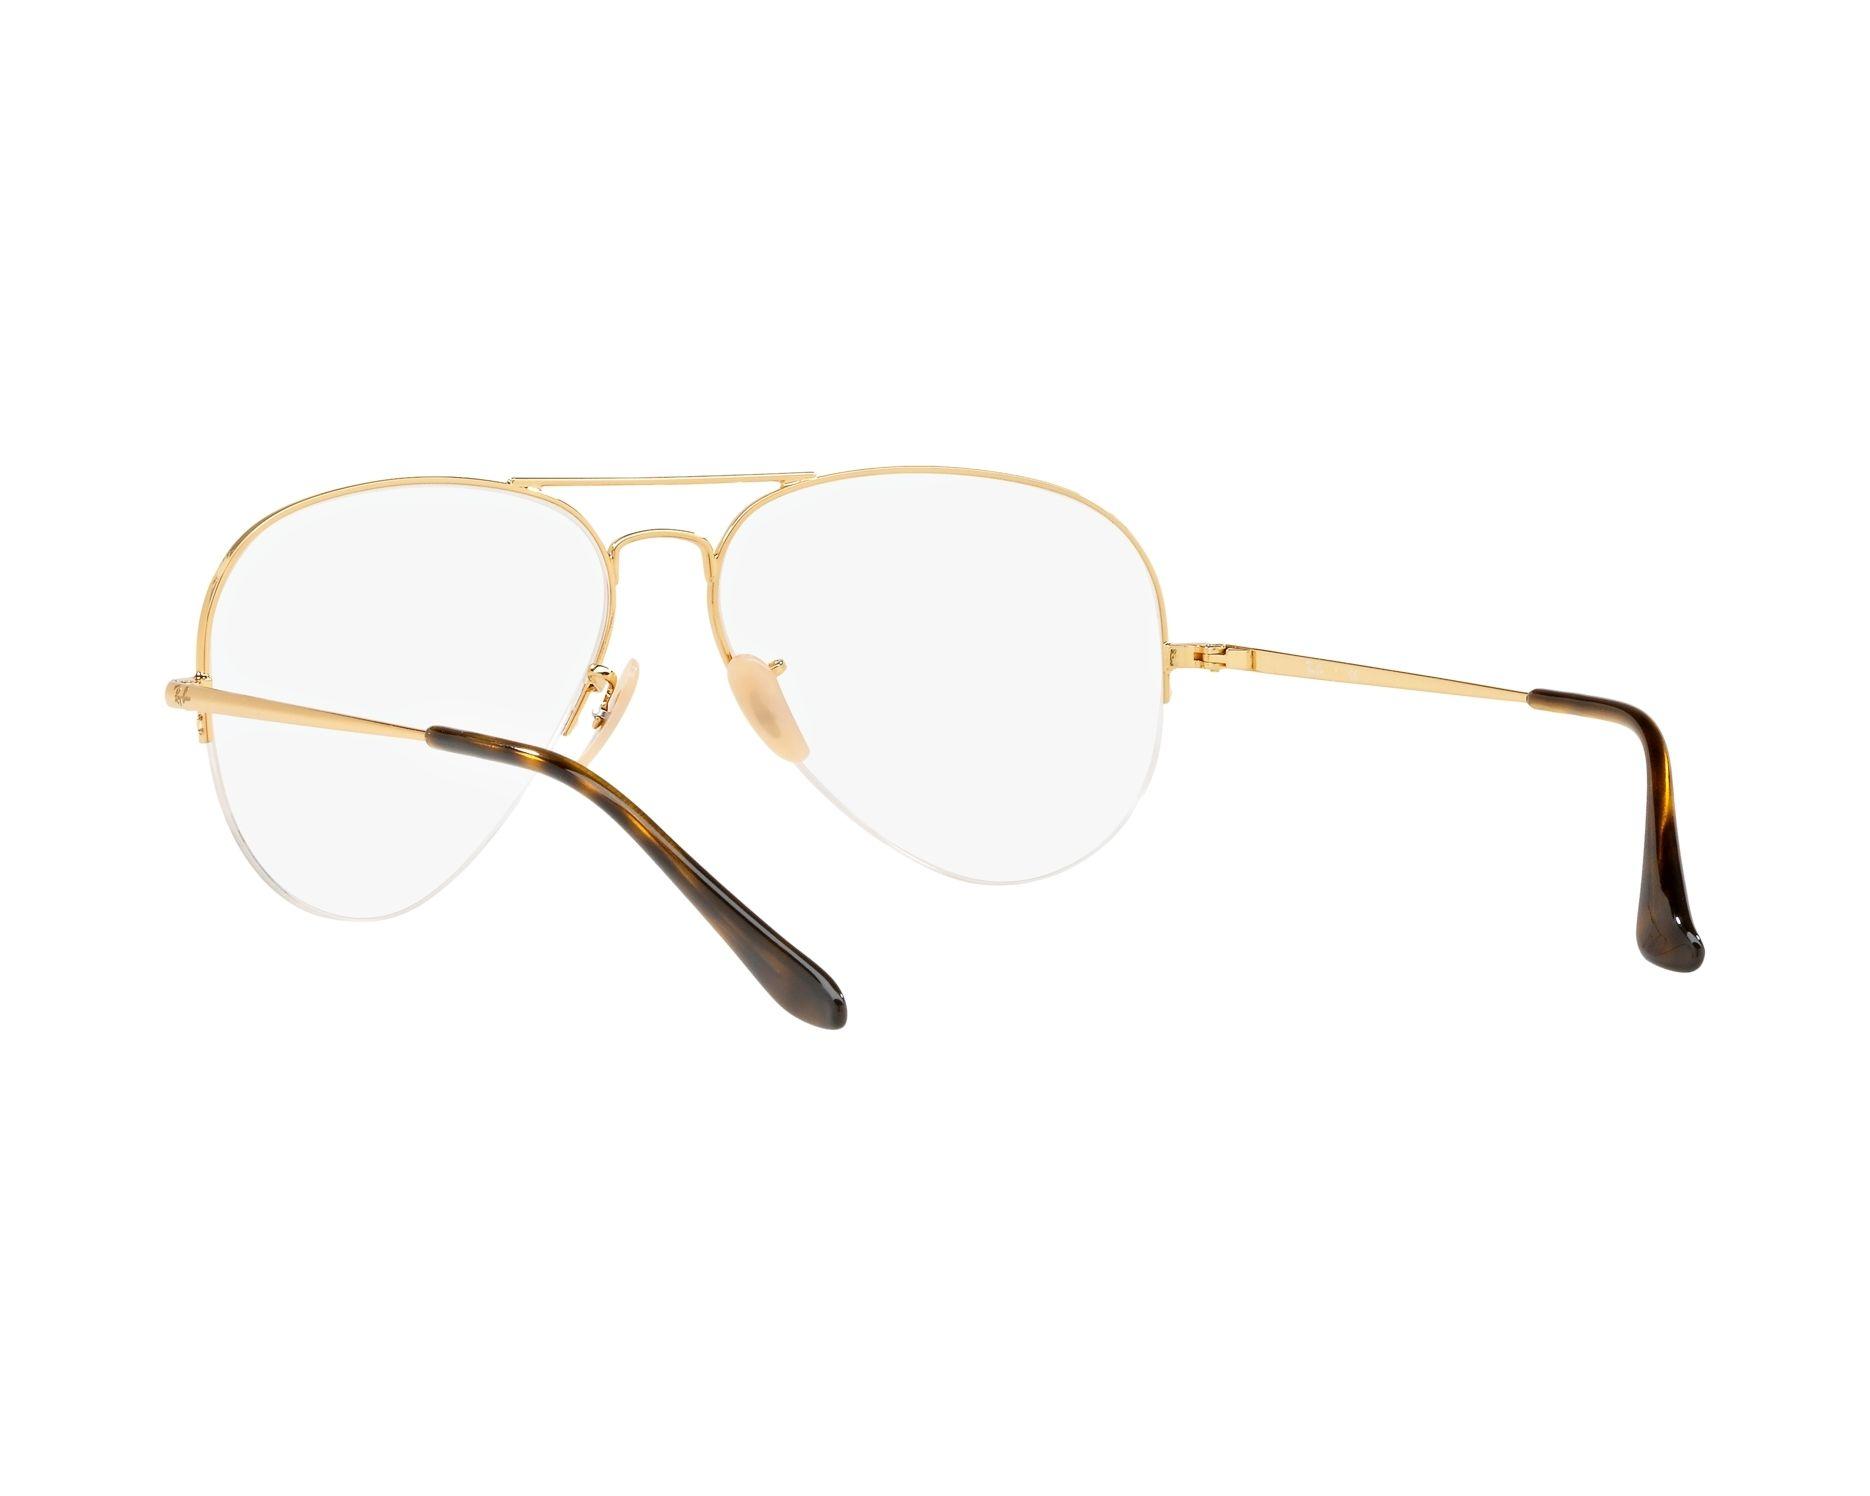 30bfcfb814e7 eyeglasses Ray-Ban RX-6589 2500 56-15 Gold 360 degree view 6